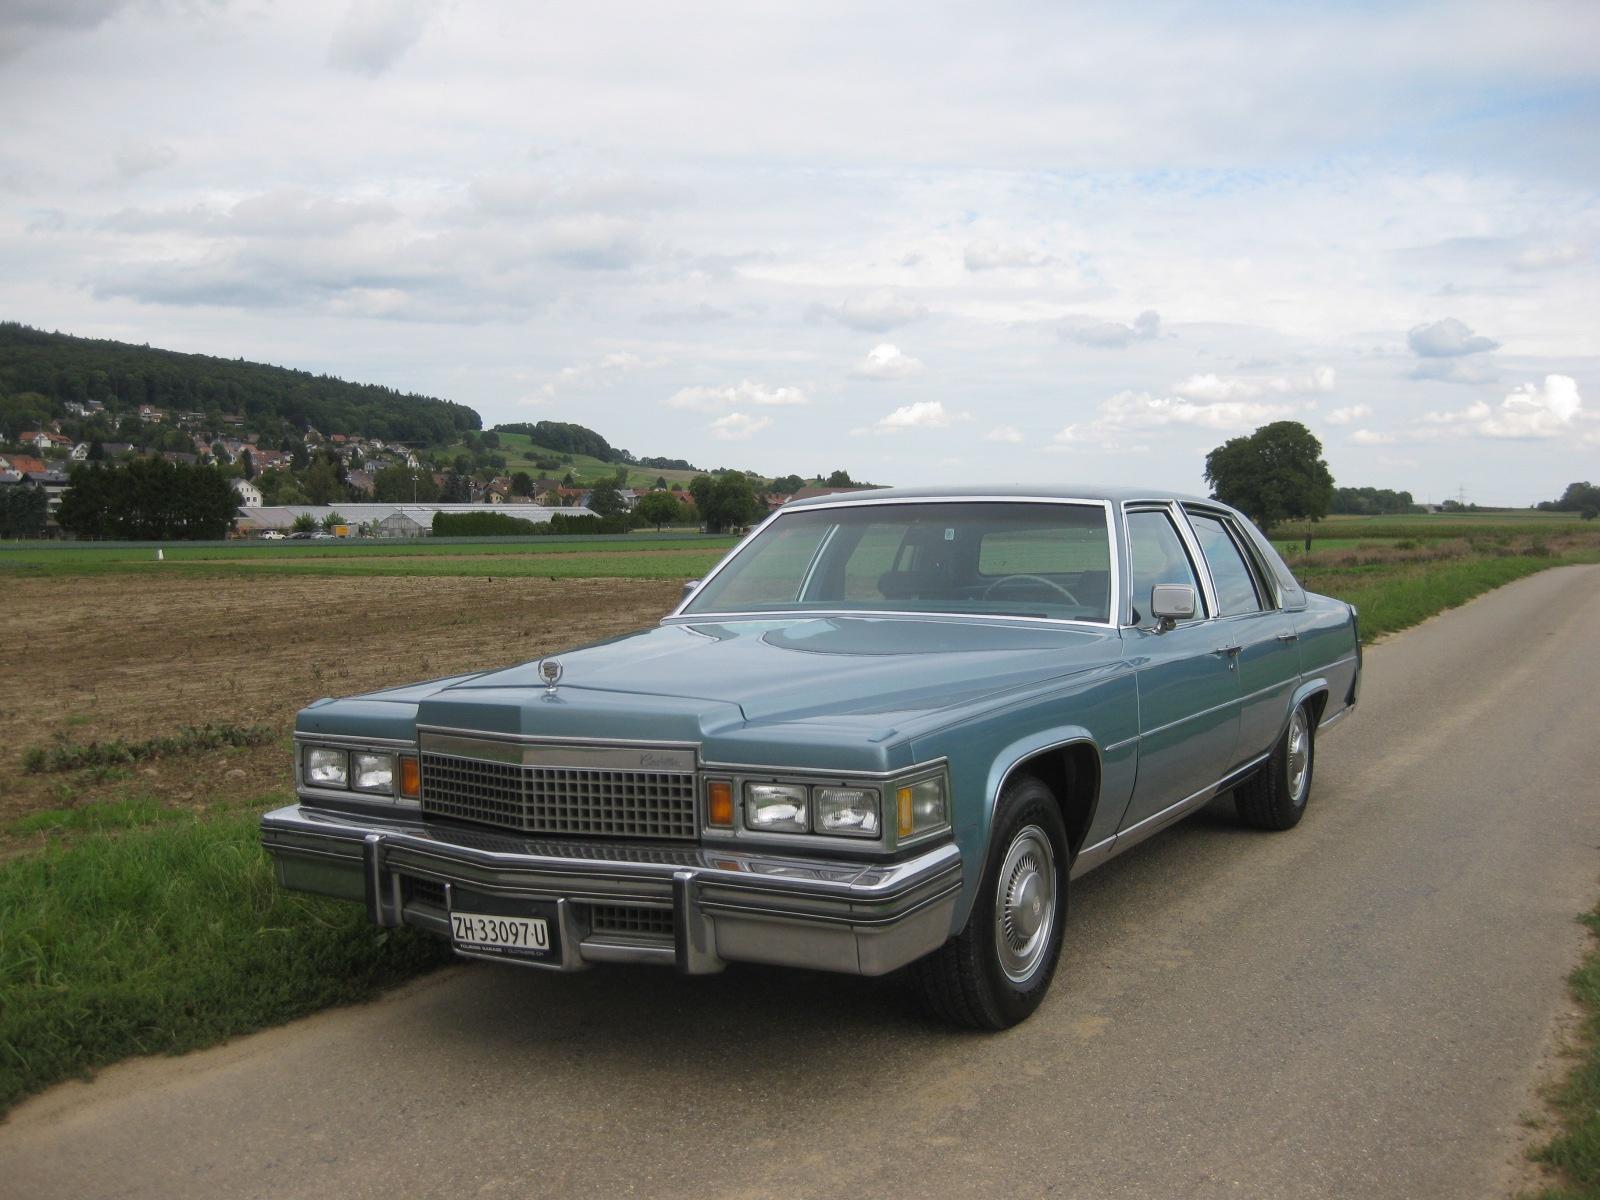 1980 Cadillac Fleetwood Oldtimer Zu Verkaufen 1951 Sedan